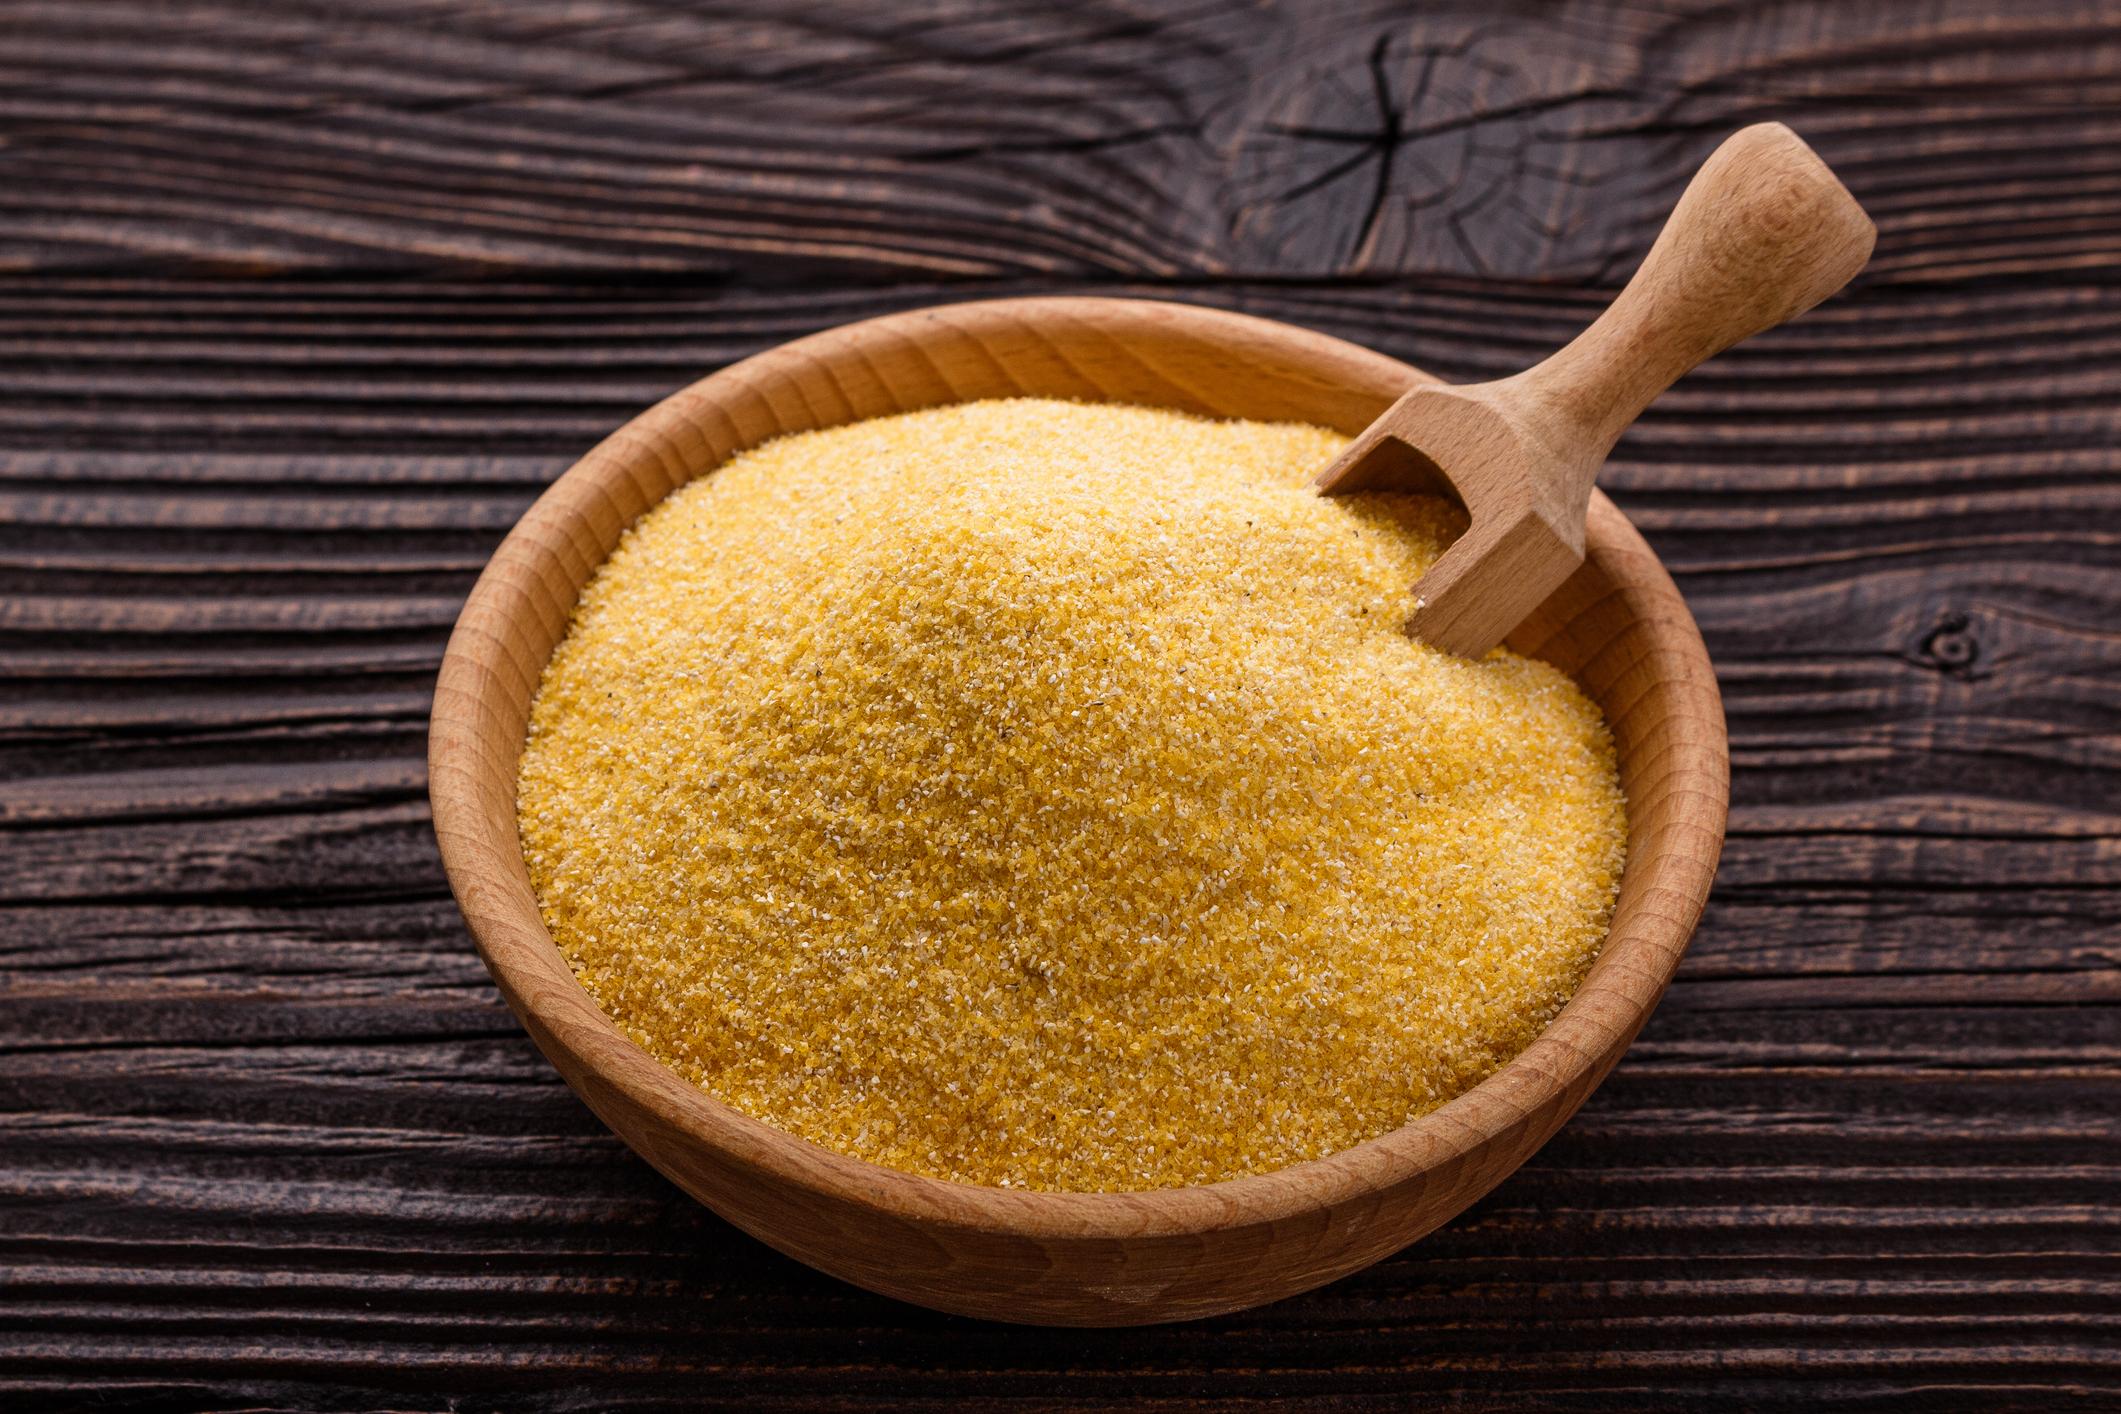 Bowl of cornmeal